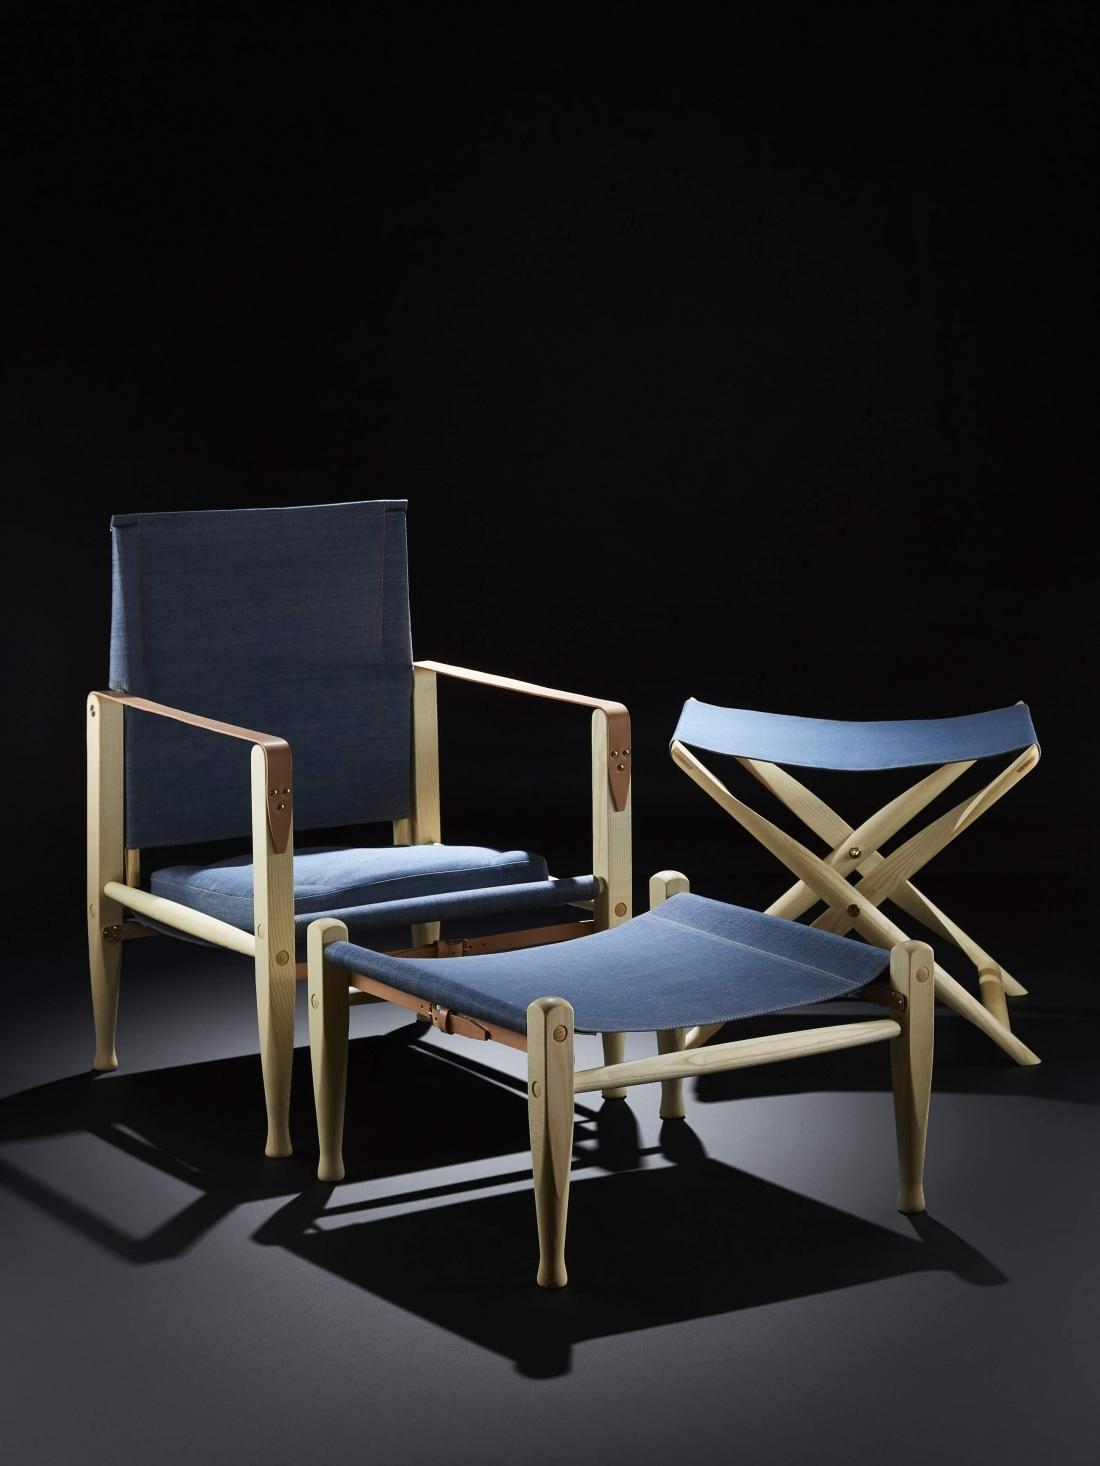 Kaare Klint Propeller Stool, Safari Chair & Footstool